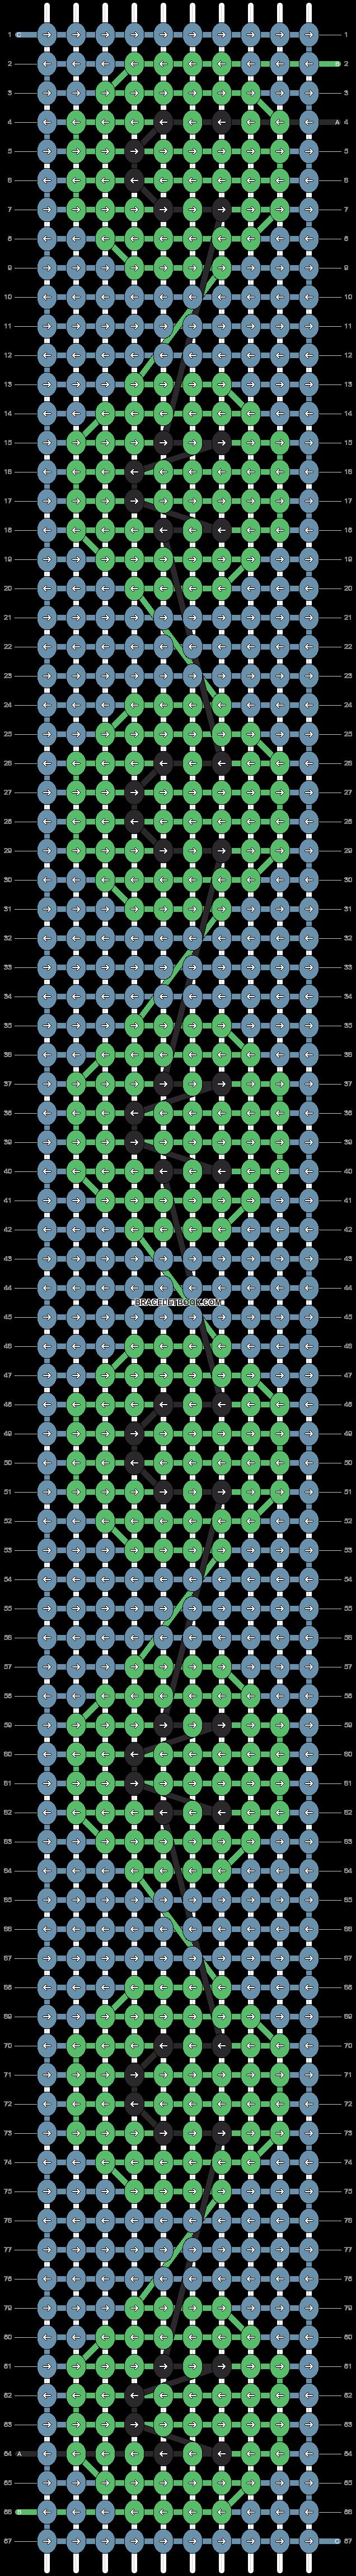 Alpha pattern #86446 variation #156423 pattern